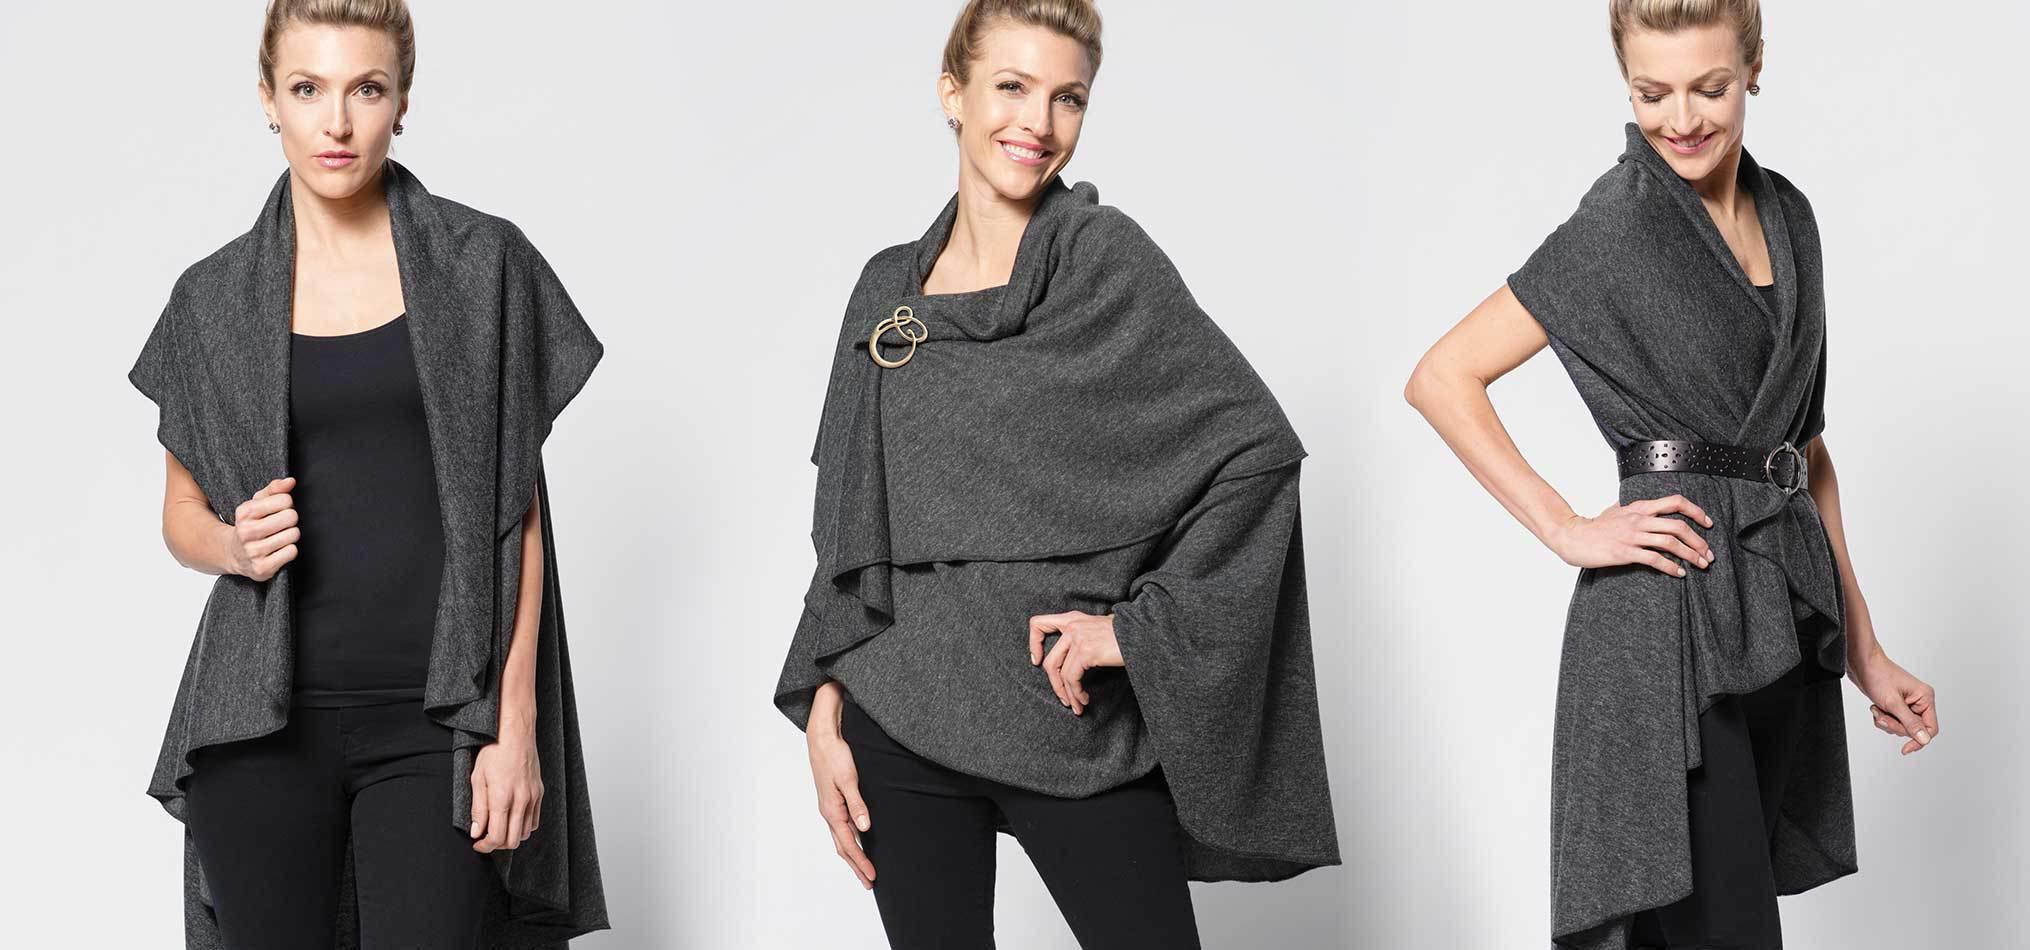 slp-fashion-card-1-apparel.jpg